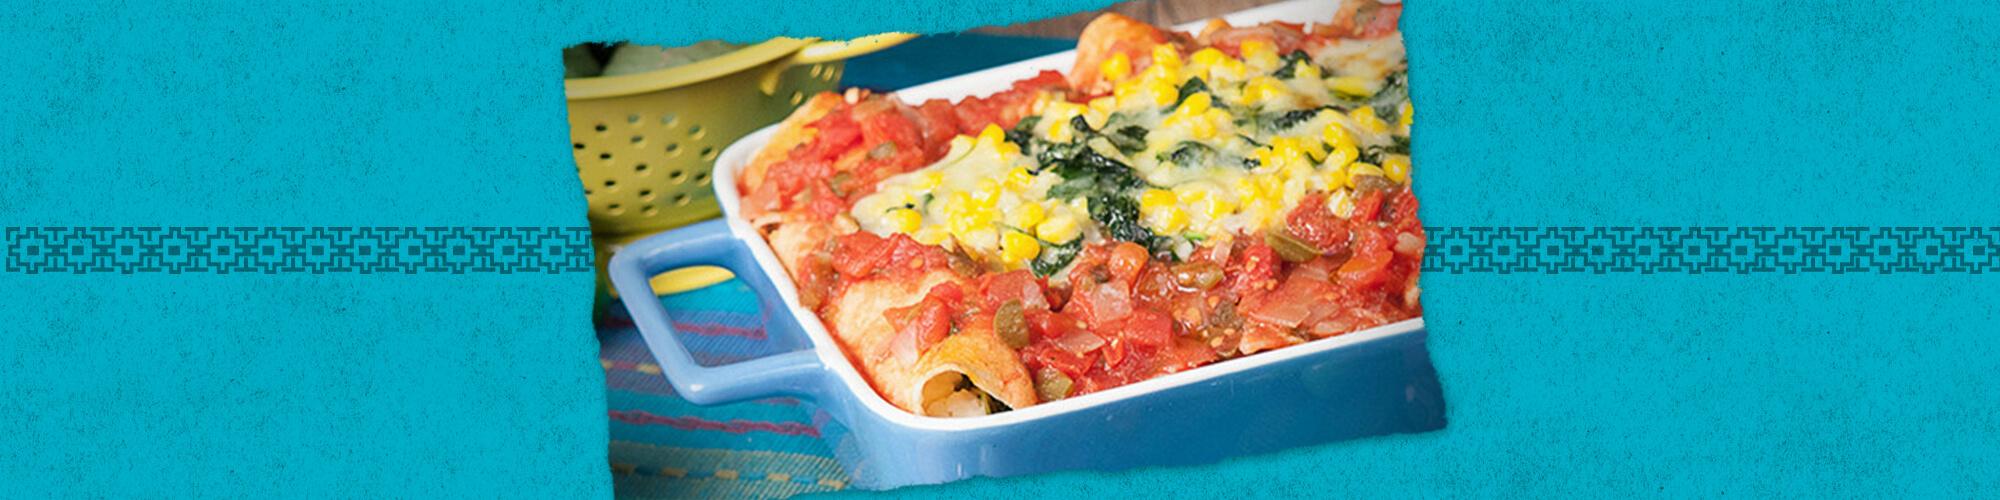 Salsas cheesy spinach enchiladas